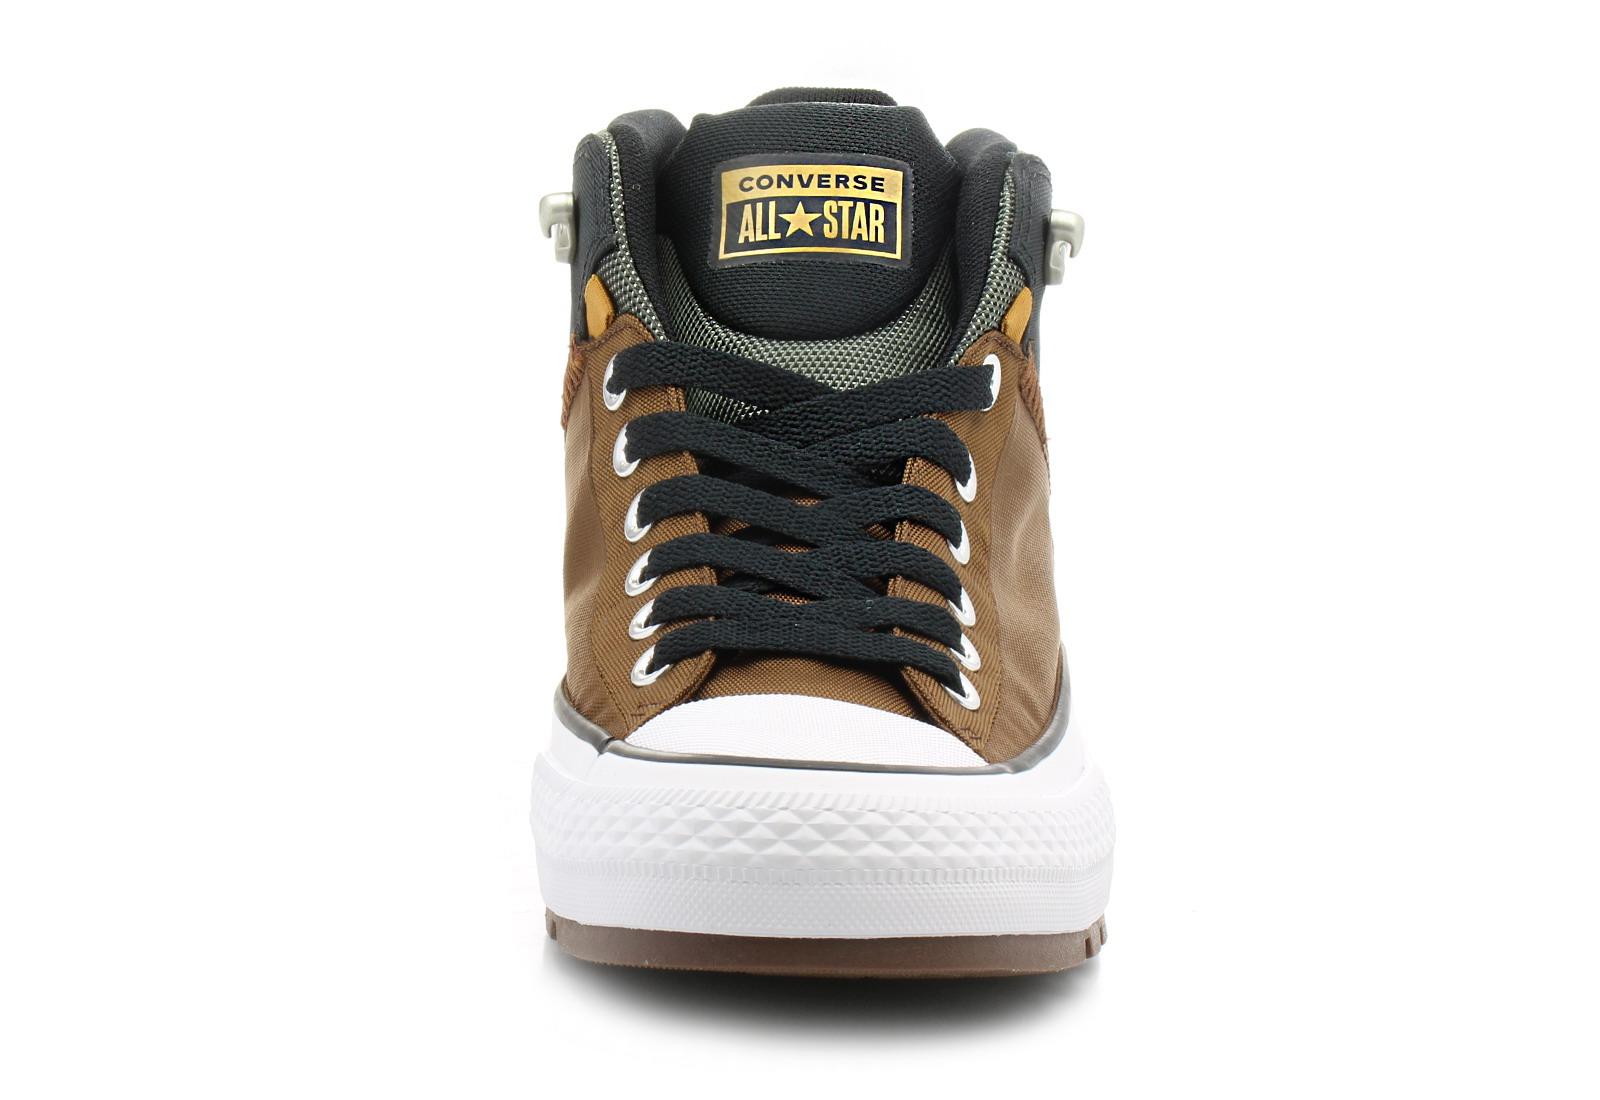 8926c23a2b6d Converse Sneakers - Chuck Taylor All Star Street Boot Hi - 161469C ...